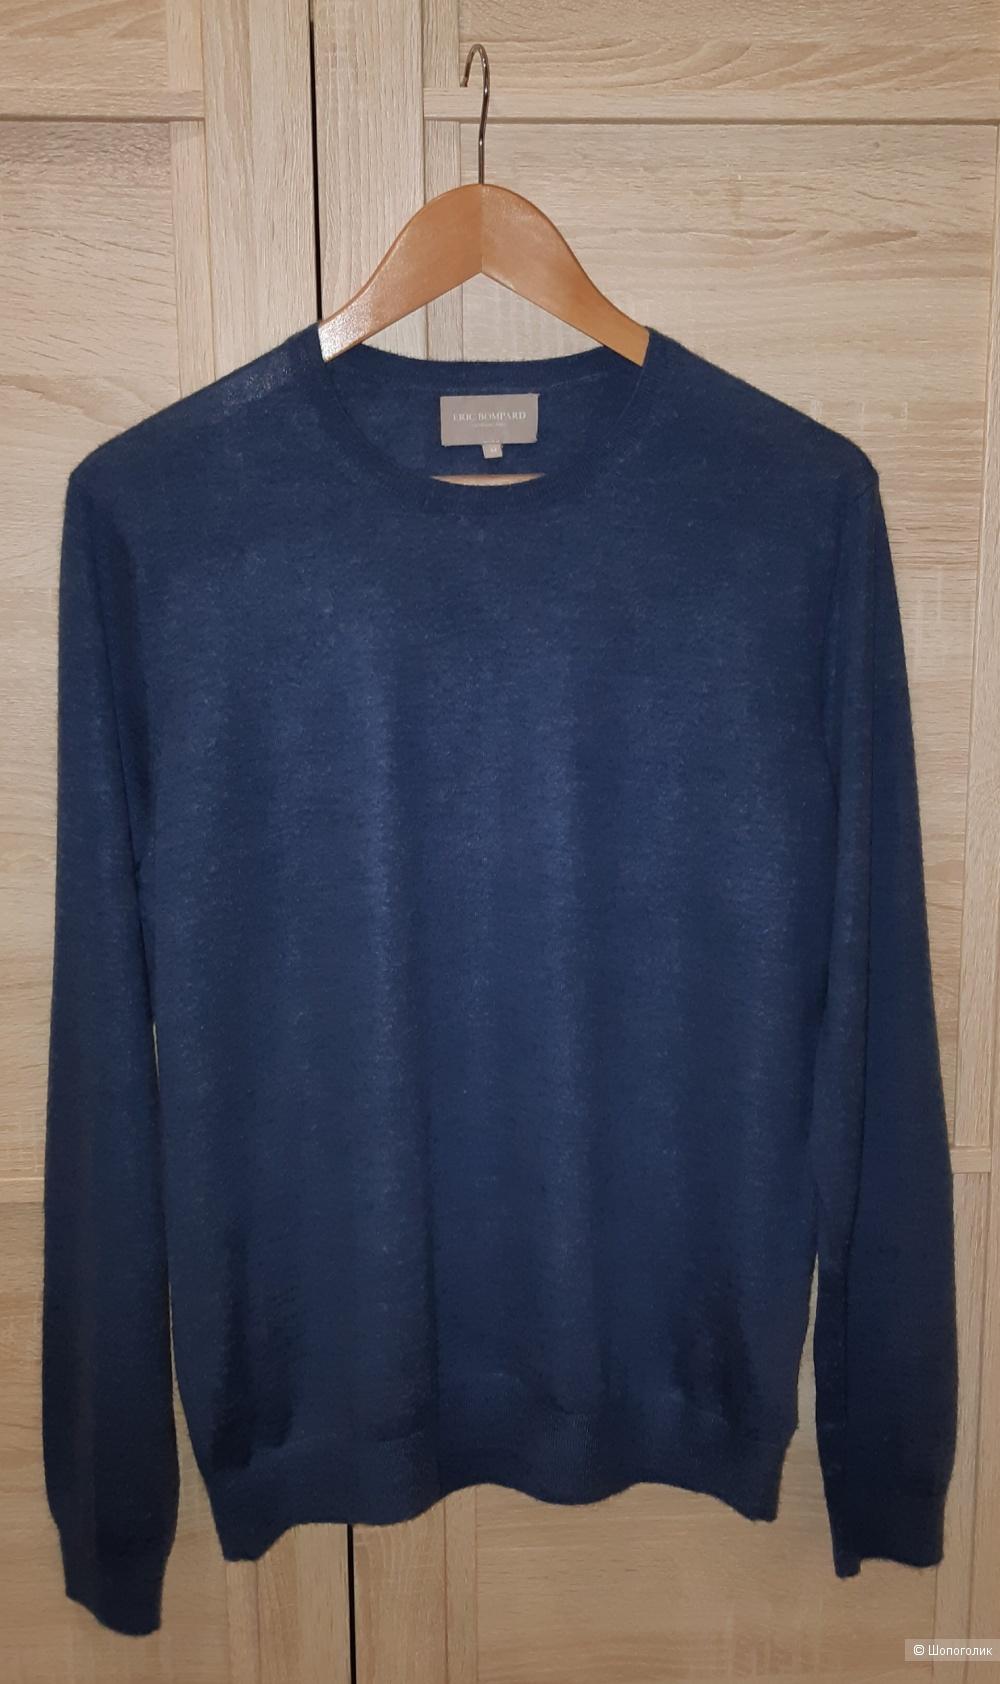 Пуловер eric bompard, размер 46/48/50